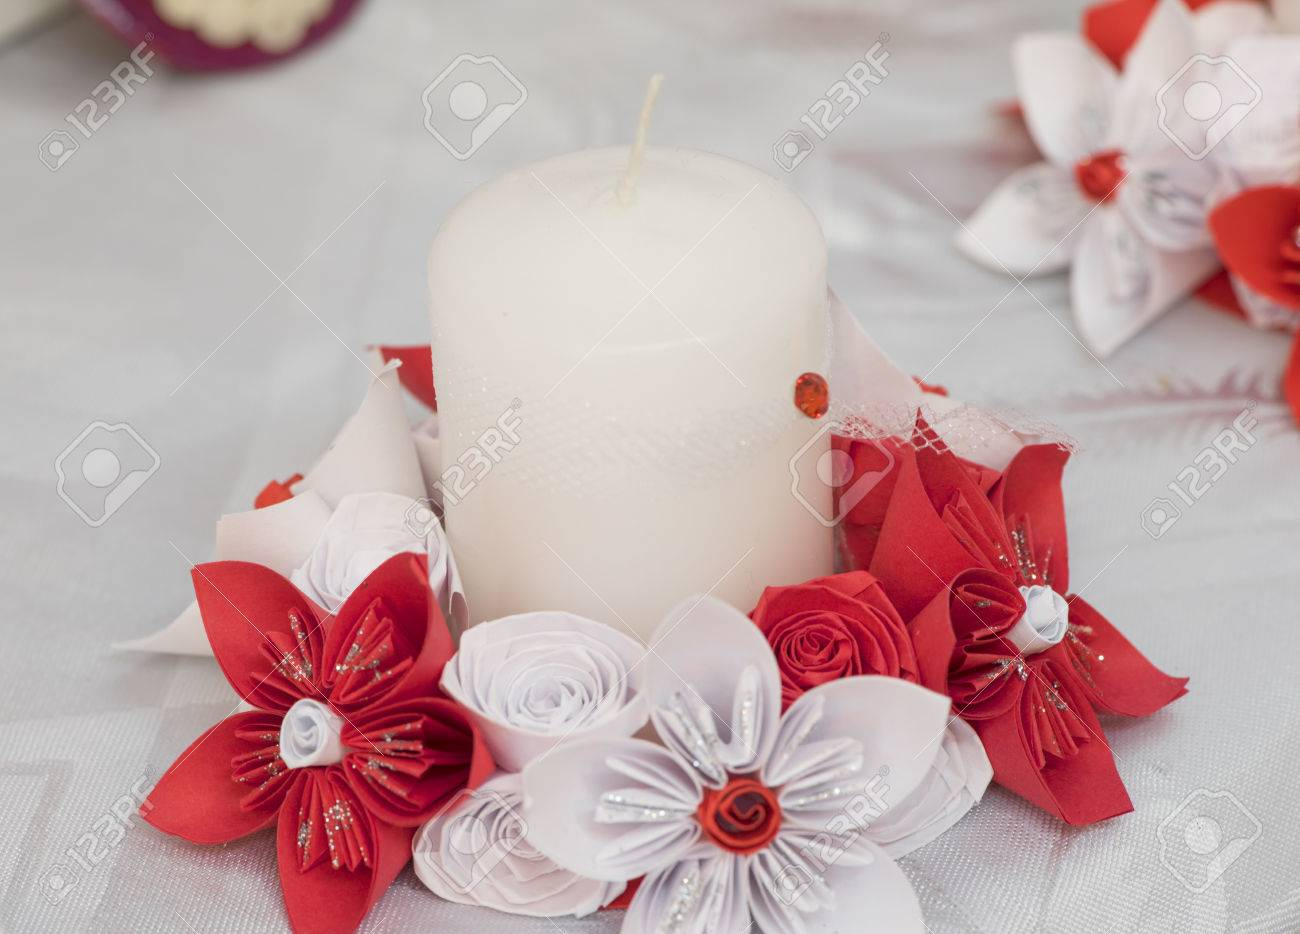 Beautiful paper flowers nice paper decoration handmade flowers beautiful paper flowers nice paper decoration handmade flowers stock photo 36781767 mightylinksfo